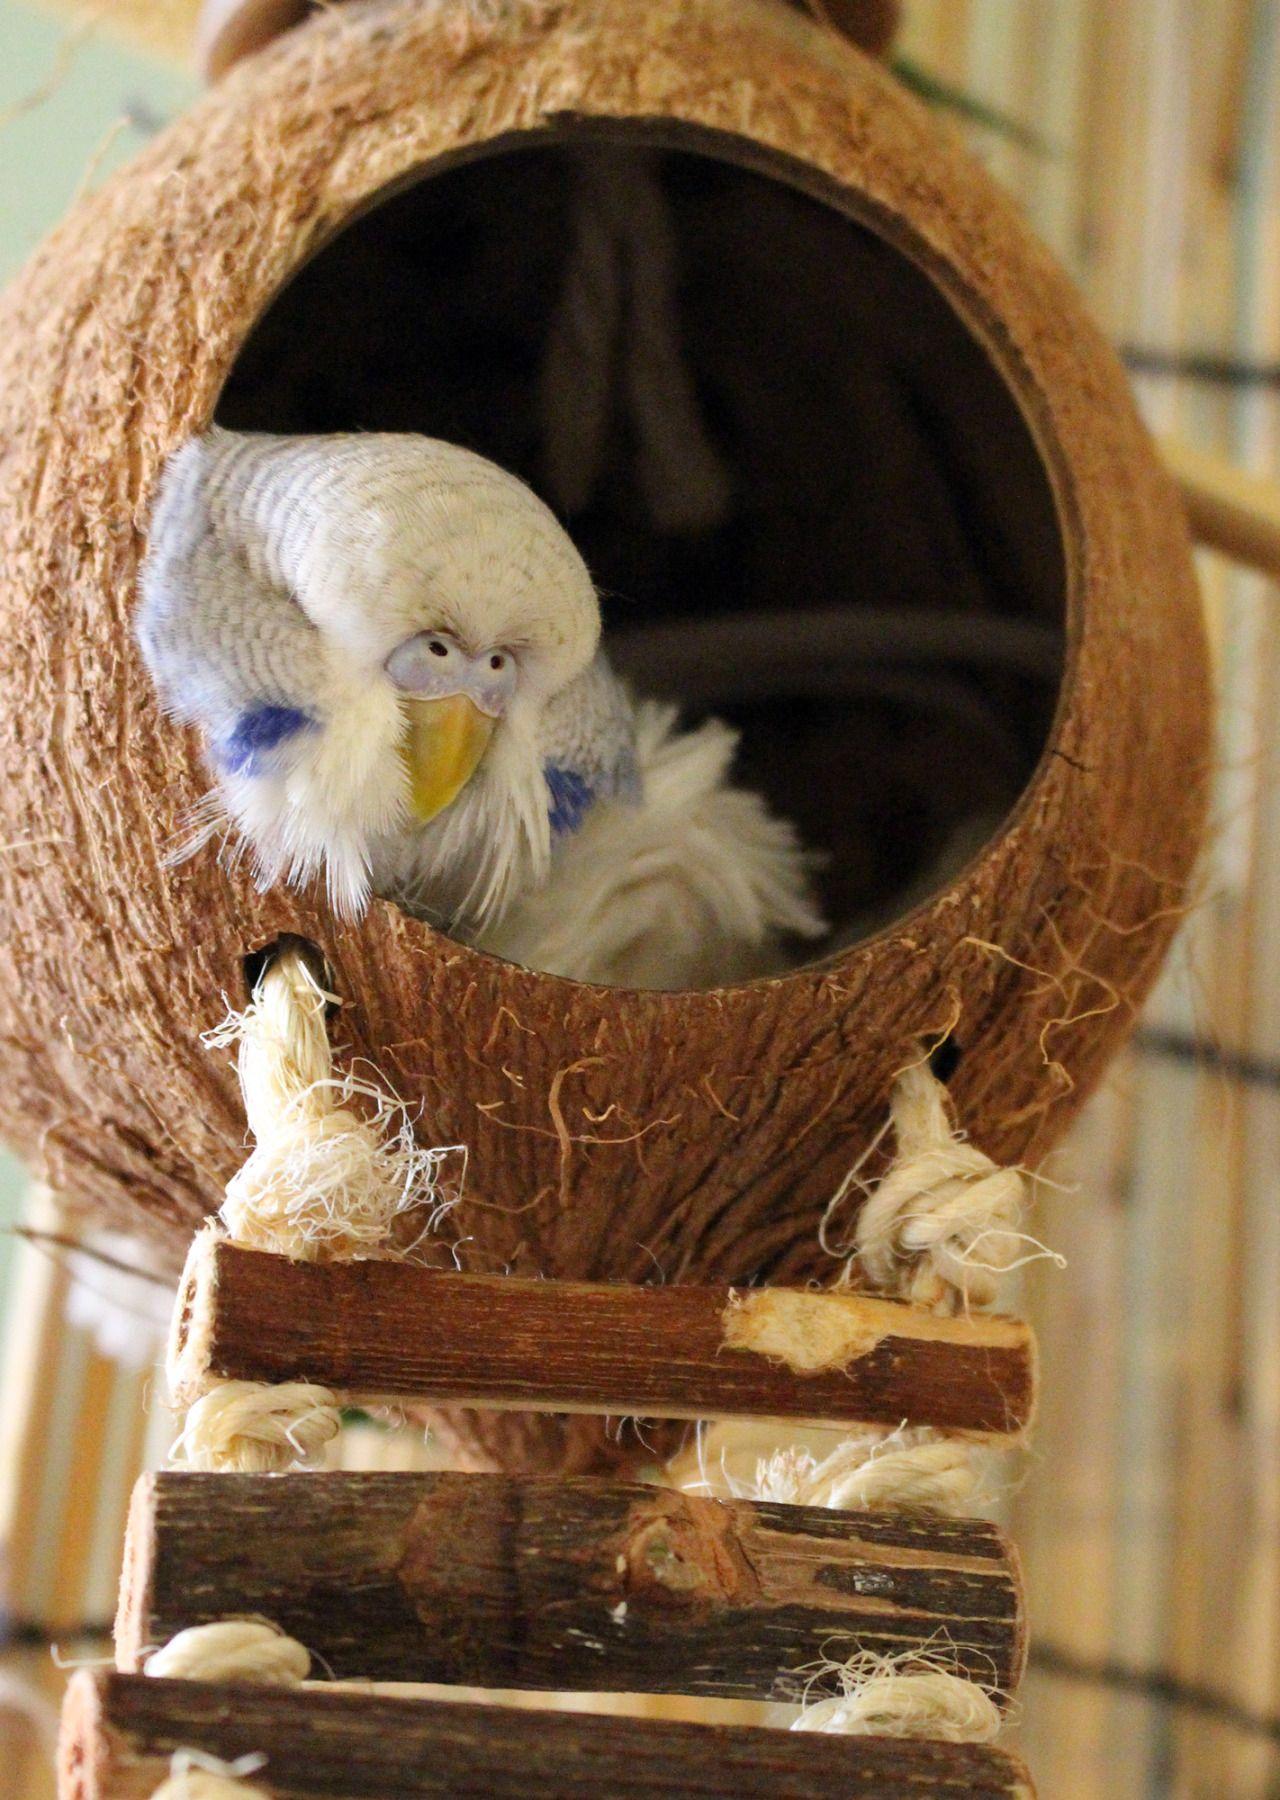 14 × 15 × 15 Cm Bird Supplies Bird Bathtub Bath Clean Box Toy For Budgies Canary Cage Trixie